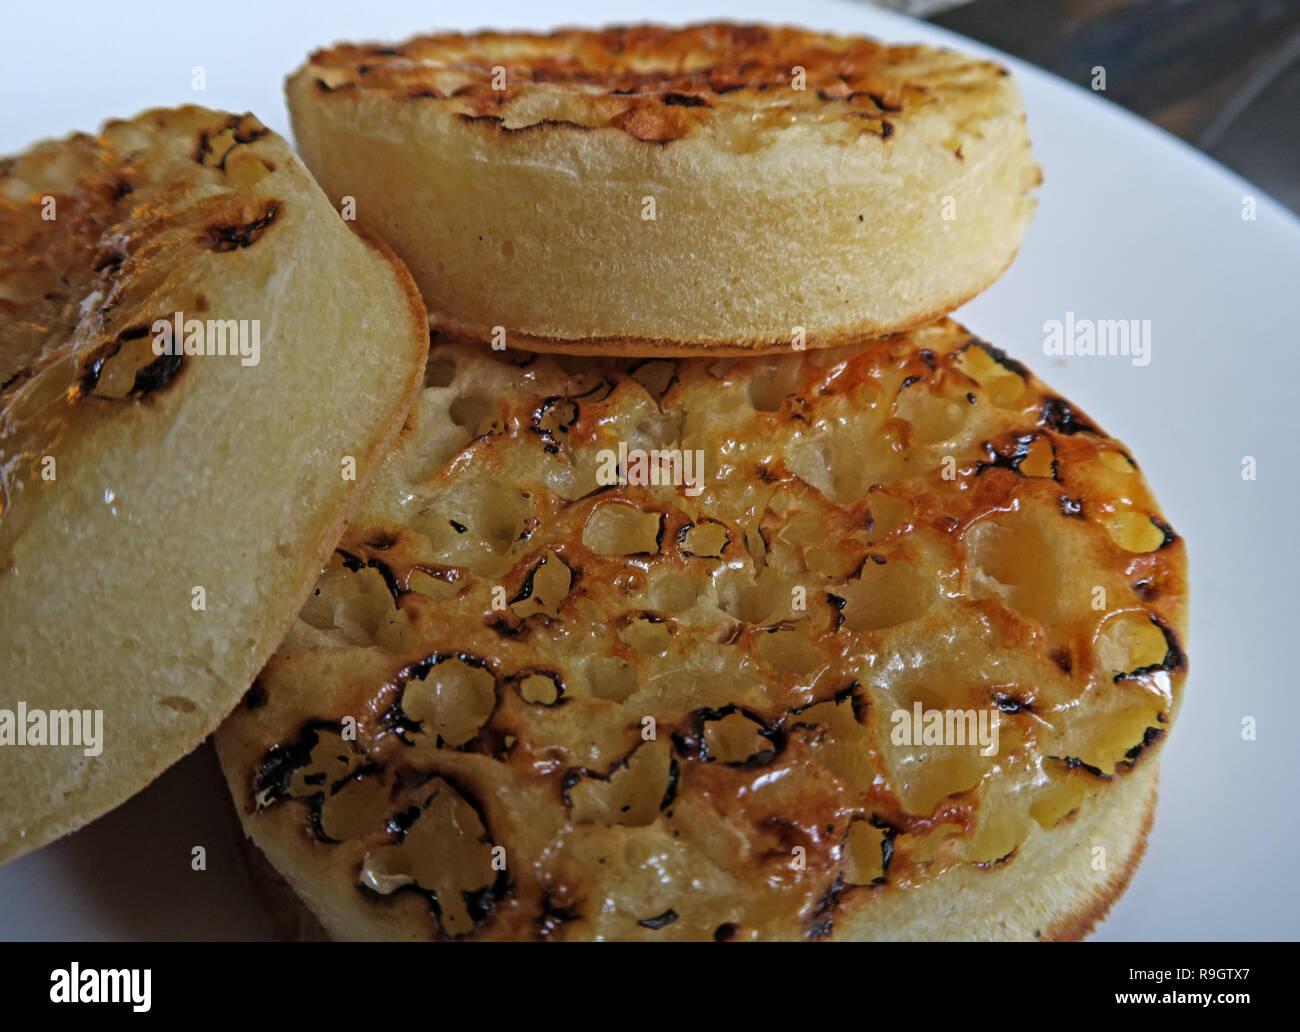 HotpixUK,@HotpixUK,GoTonySmith,buttered,toasted,sitting,hot,small